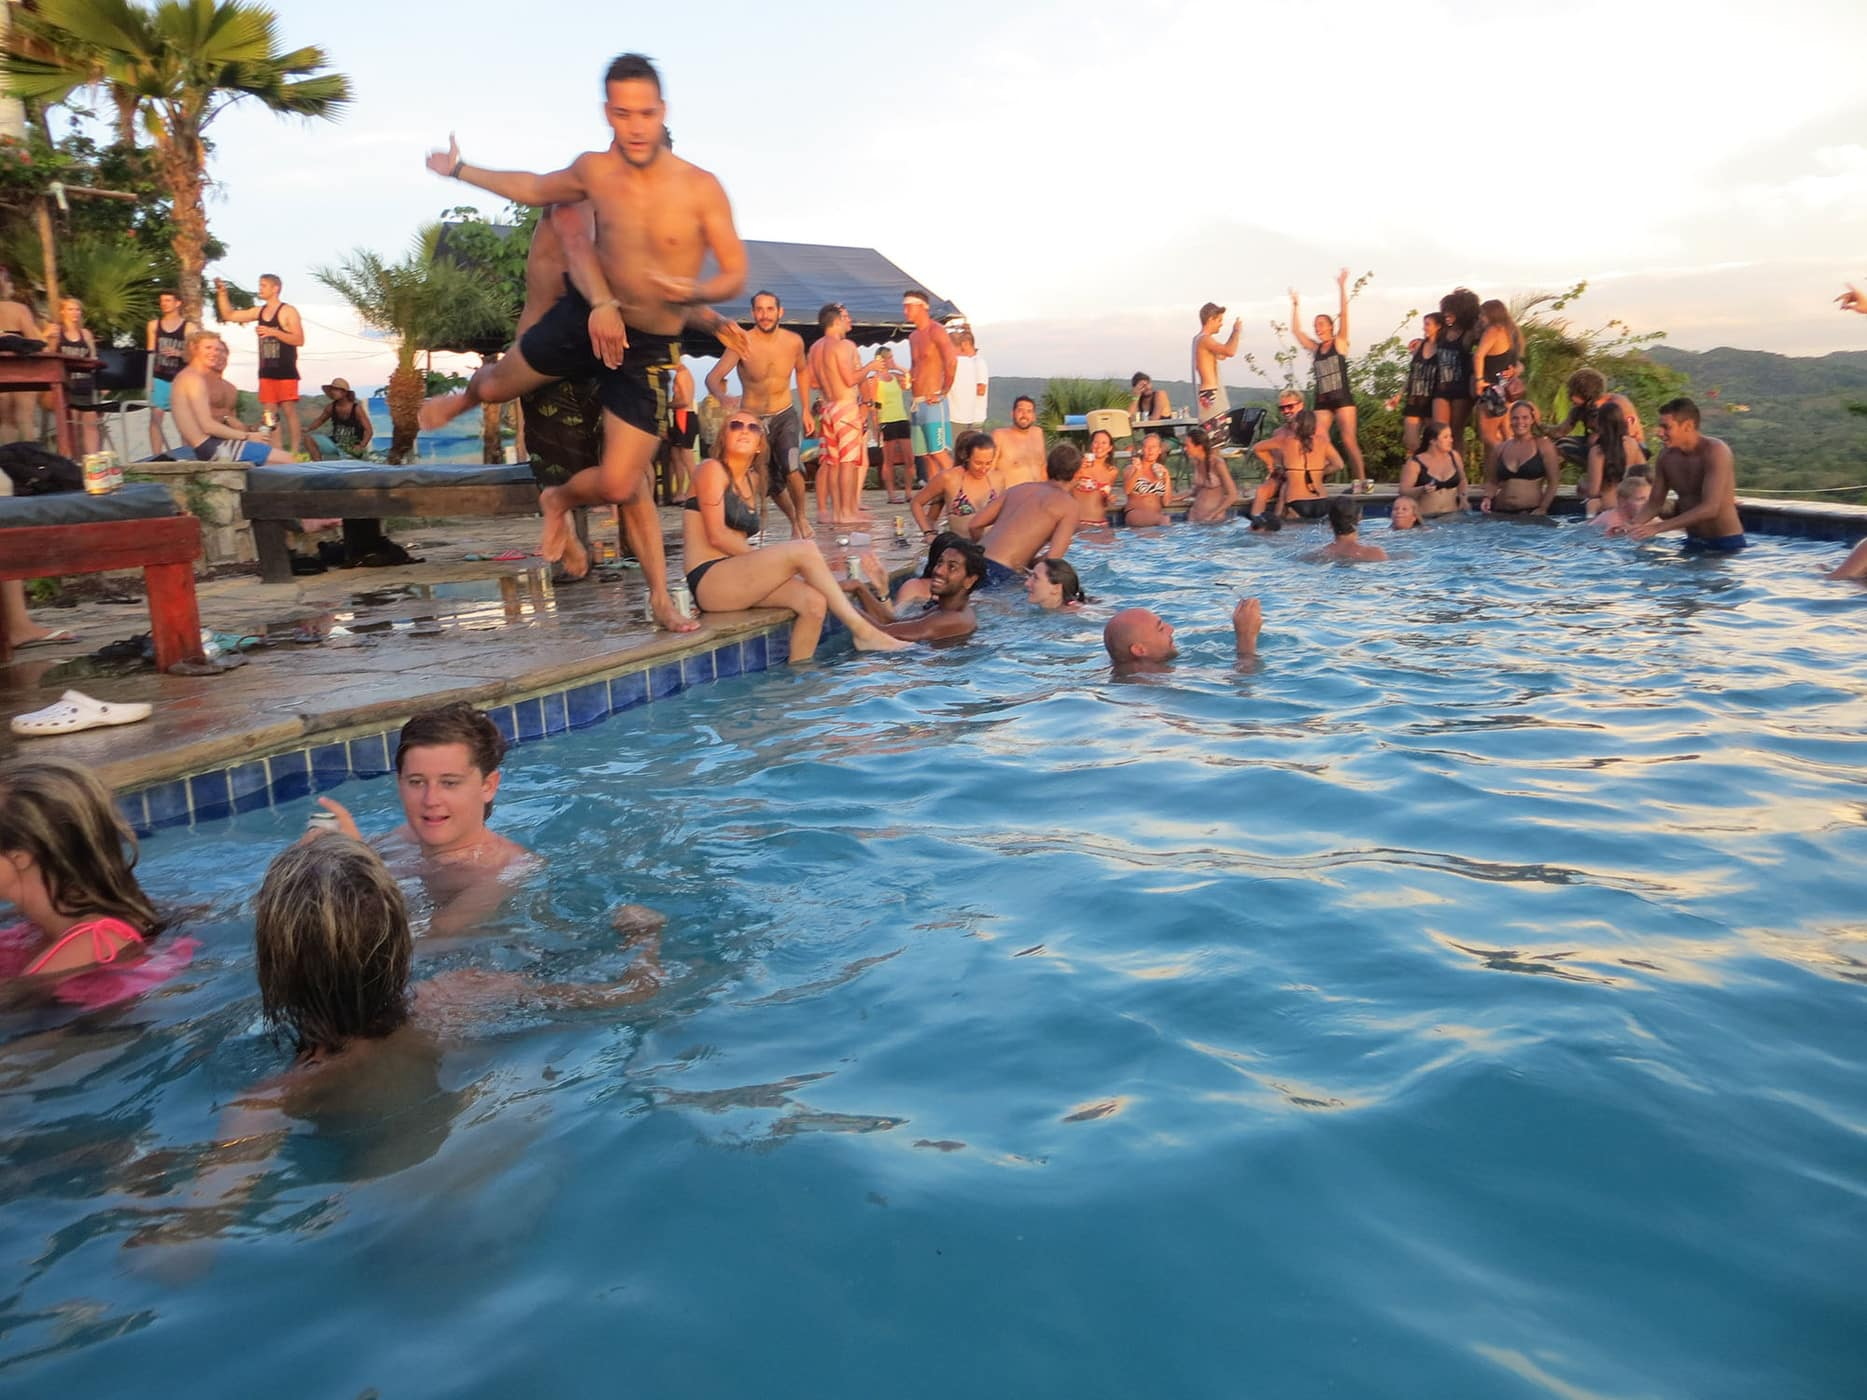 Thrown in the pool at the Sunday Funday Pool Crawl in San Juan Del Sur, Nicaragua